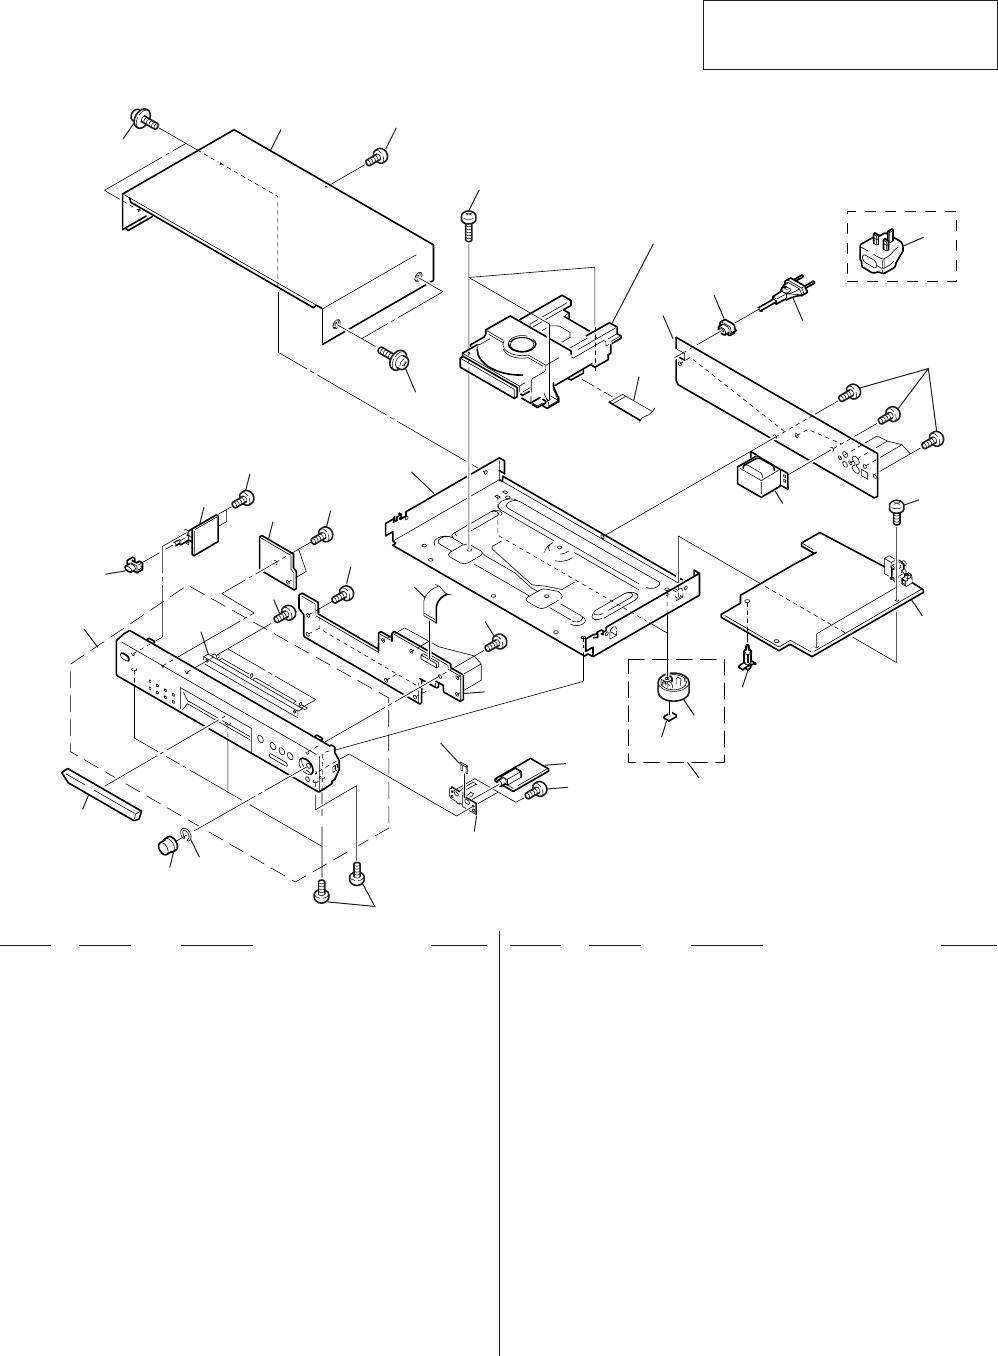 Sony Ericsson Cdp Xe570 Users Manual